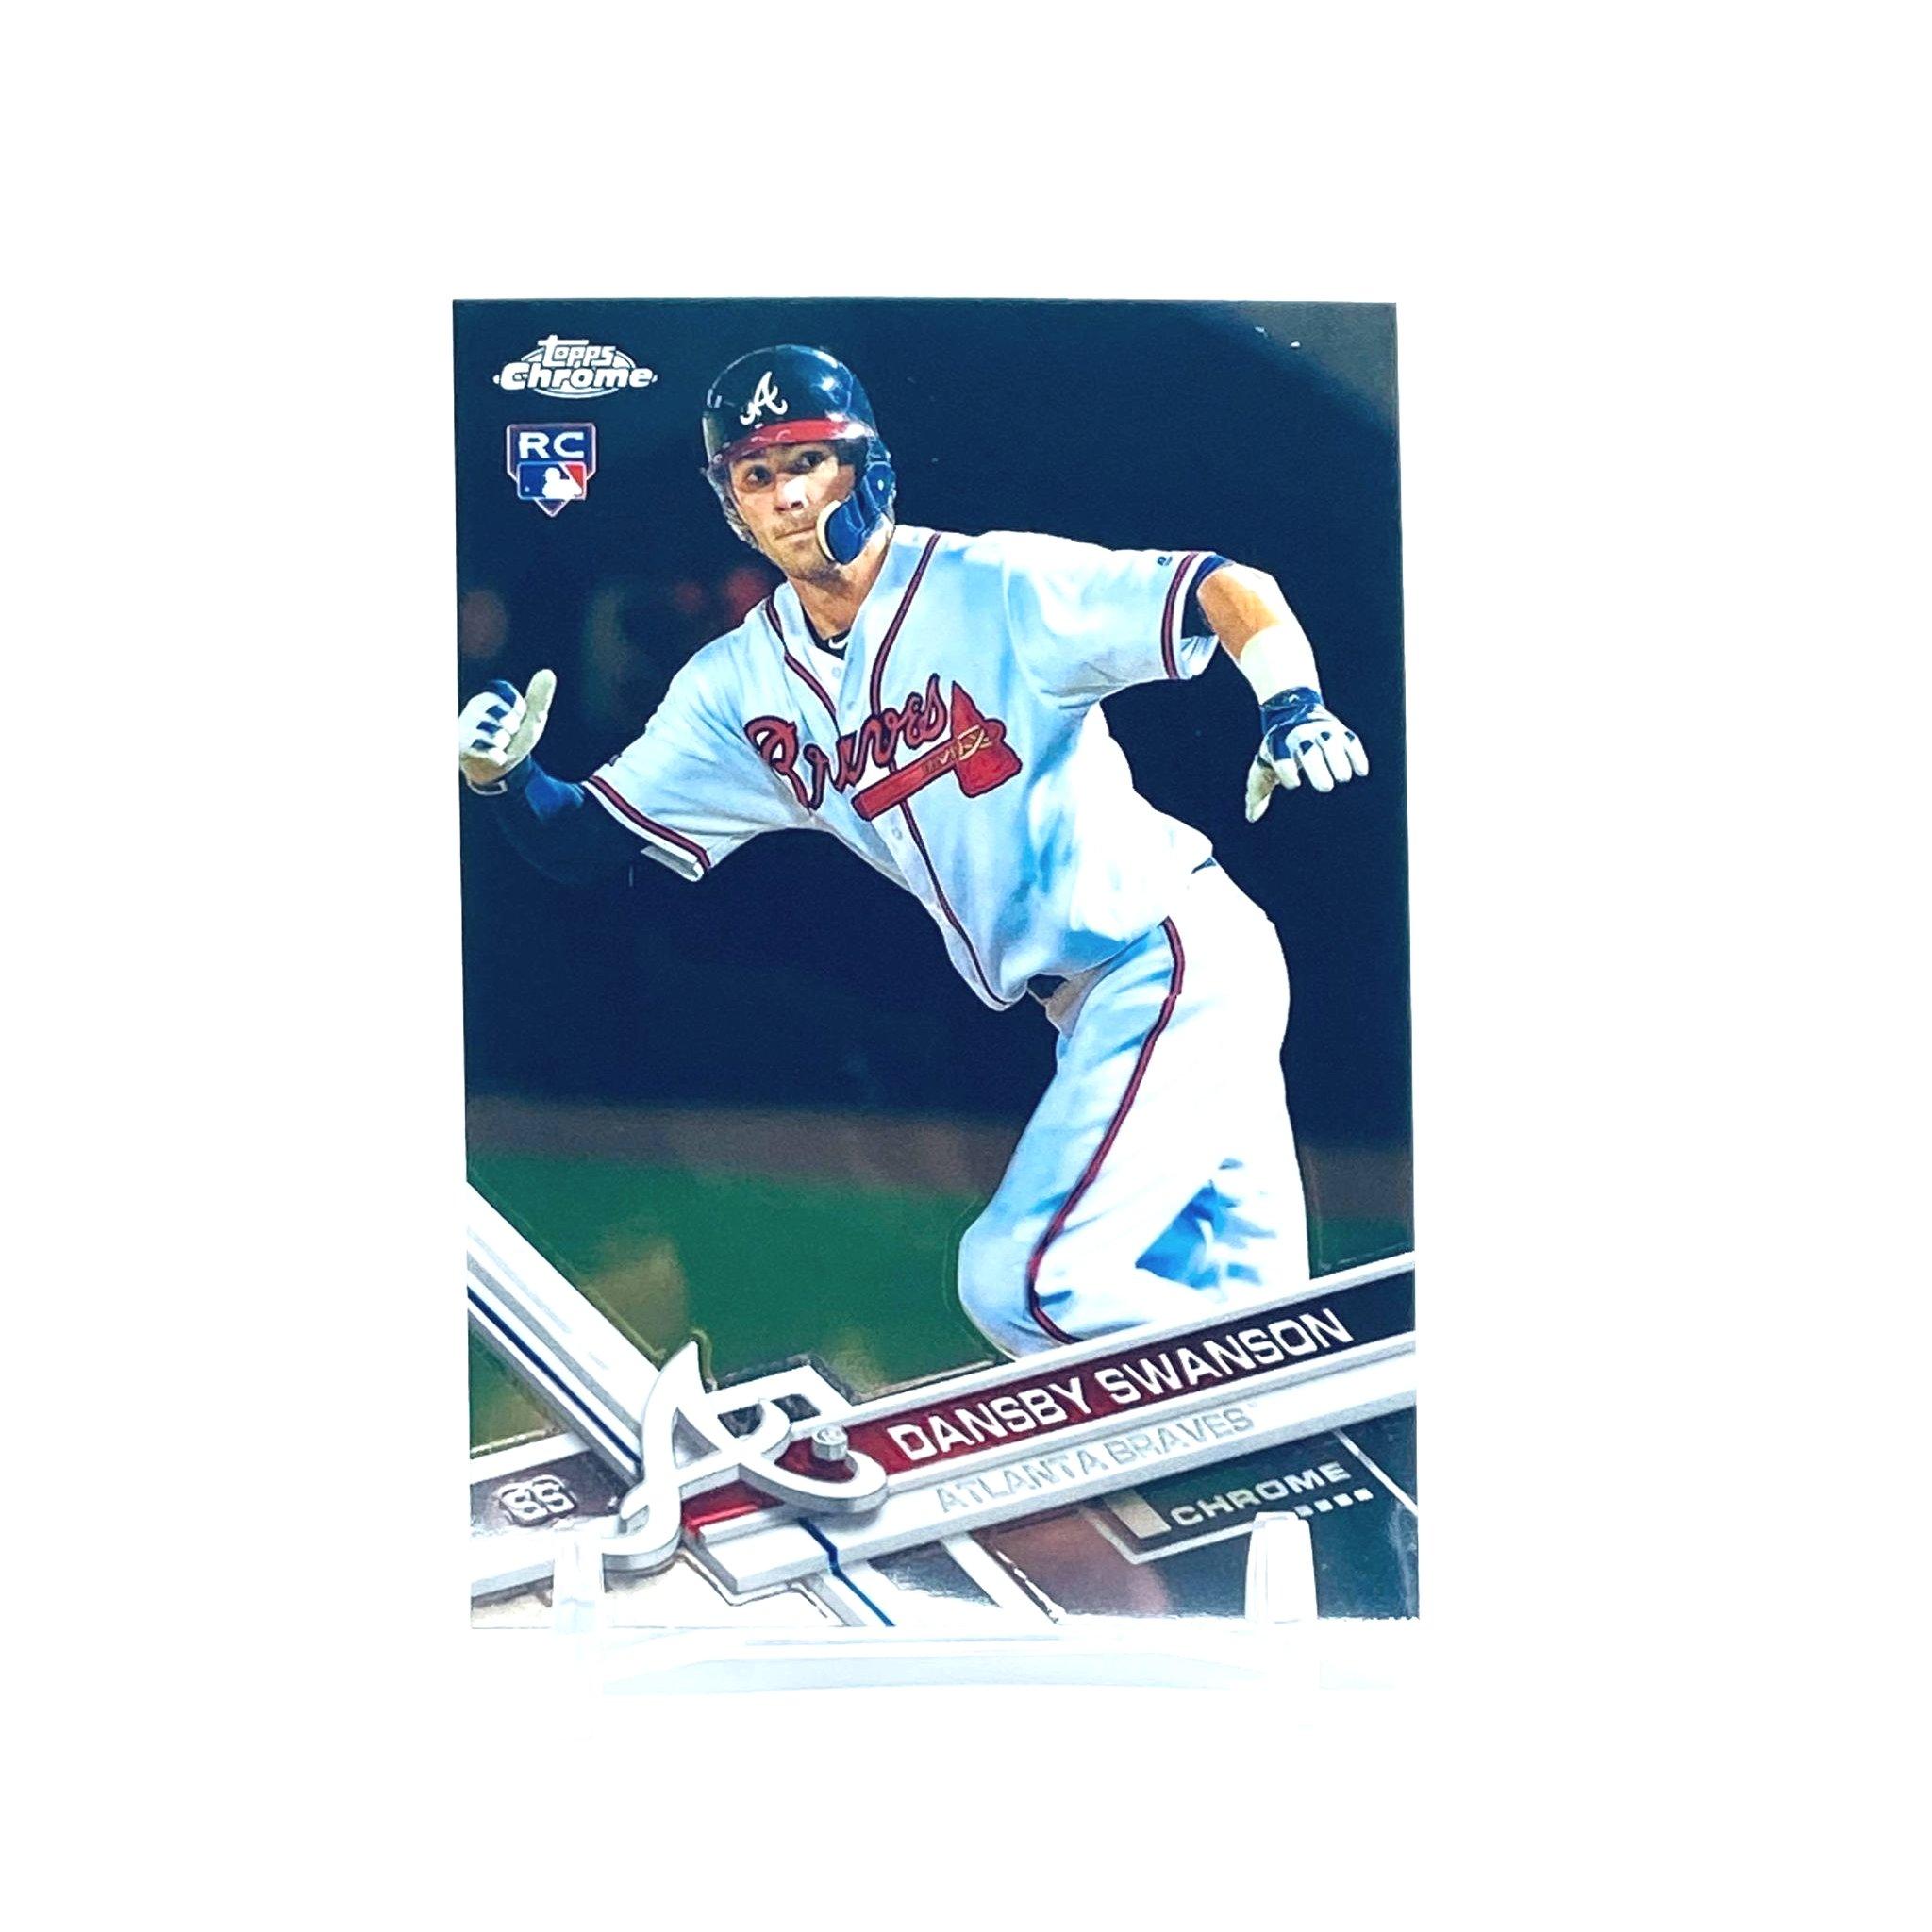 2017 Topps Chrome Dansby Swanson Rookie Card Atlanta Braves